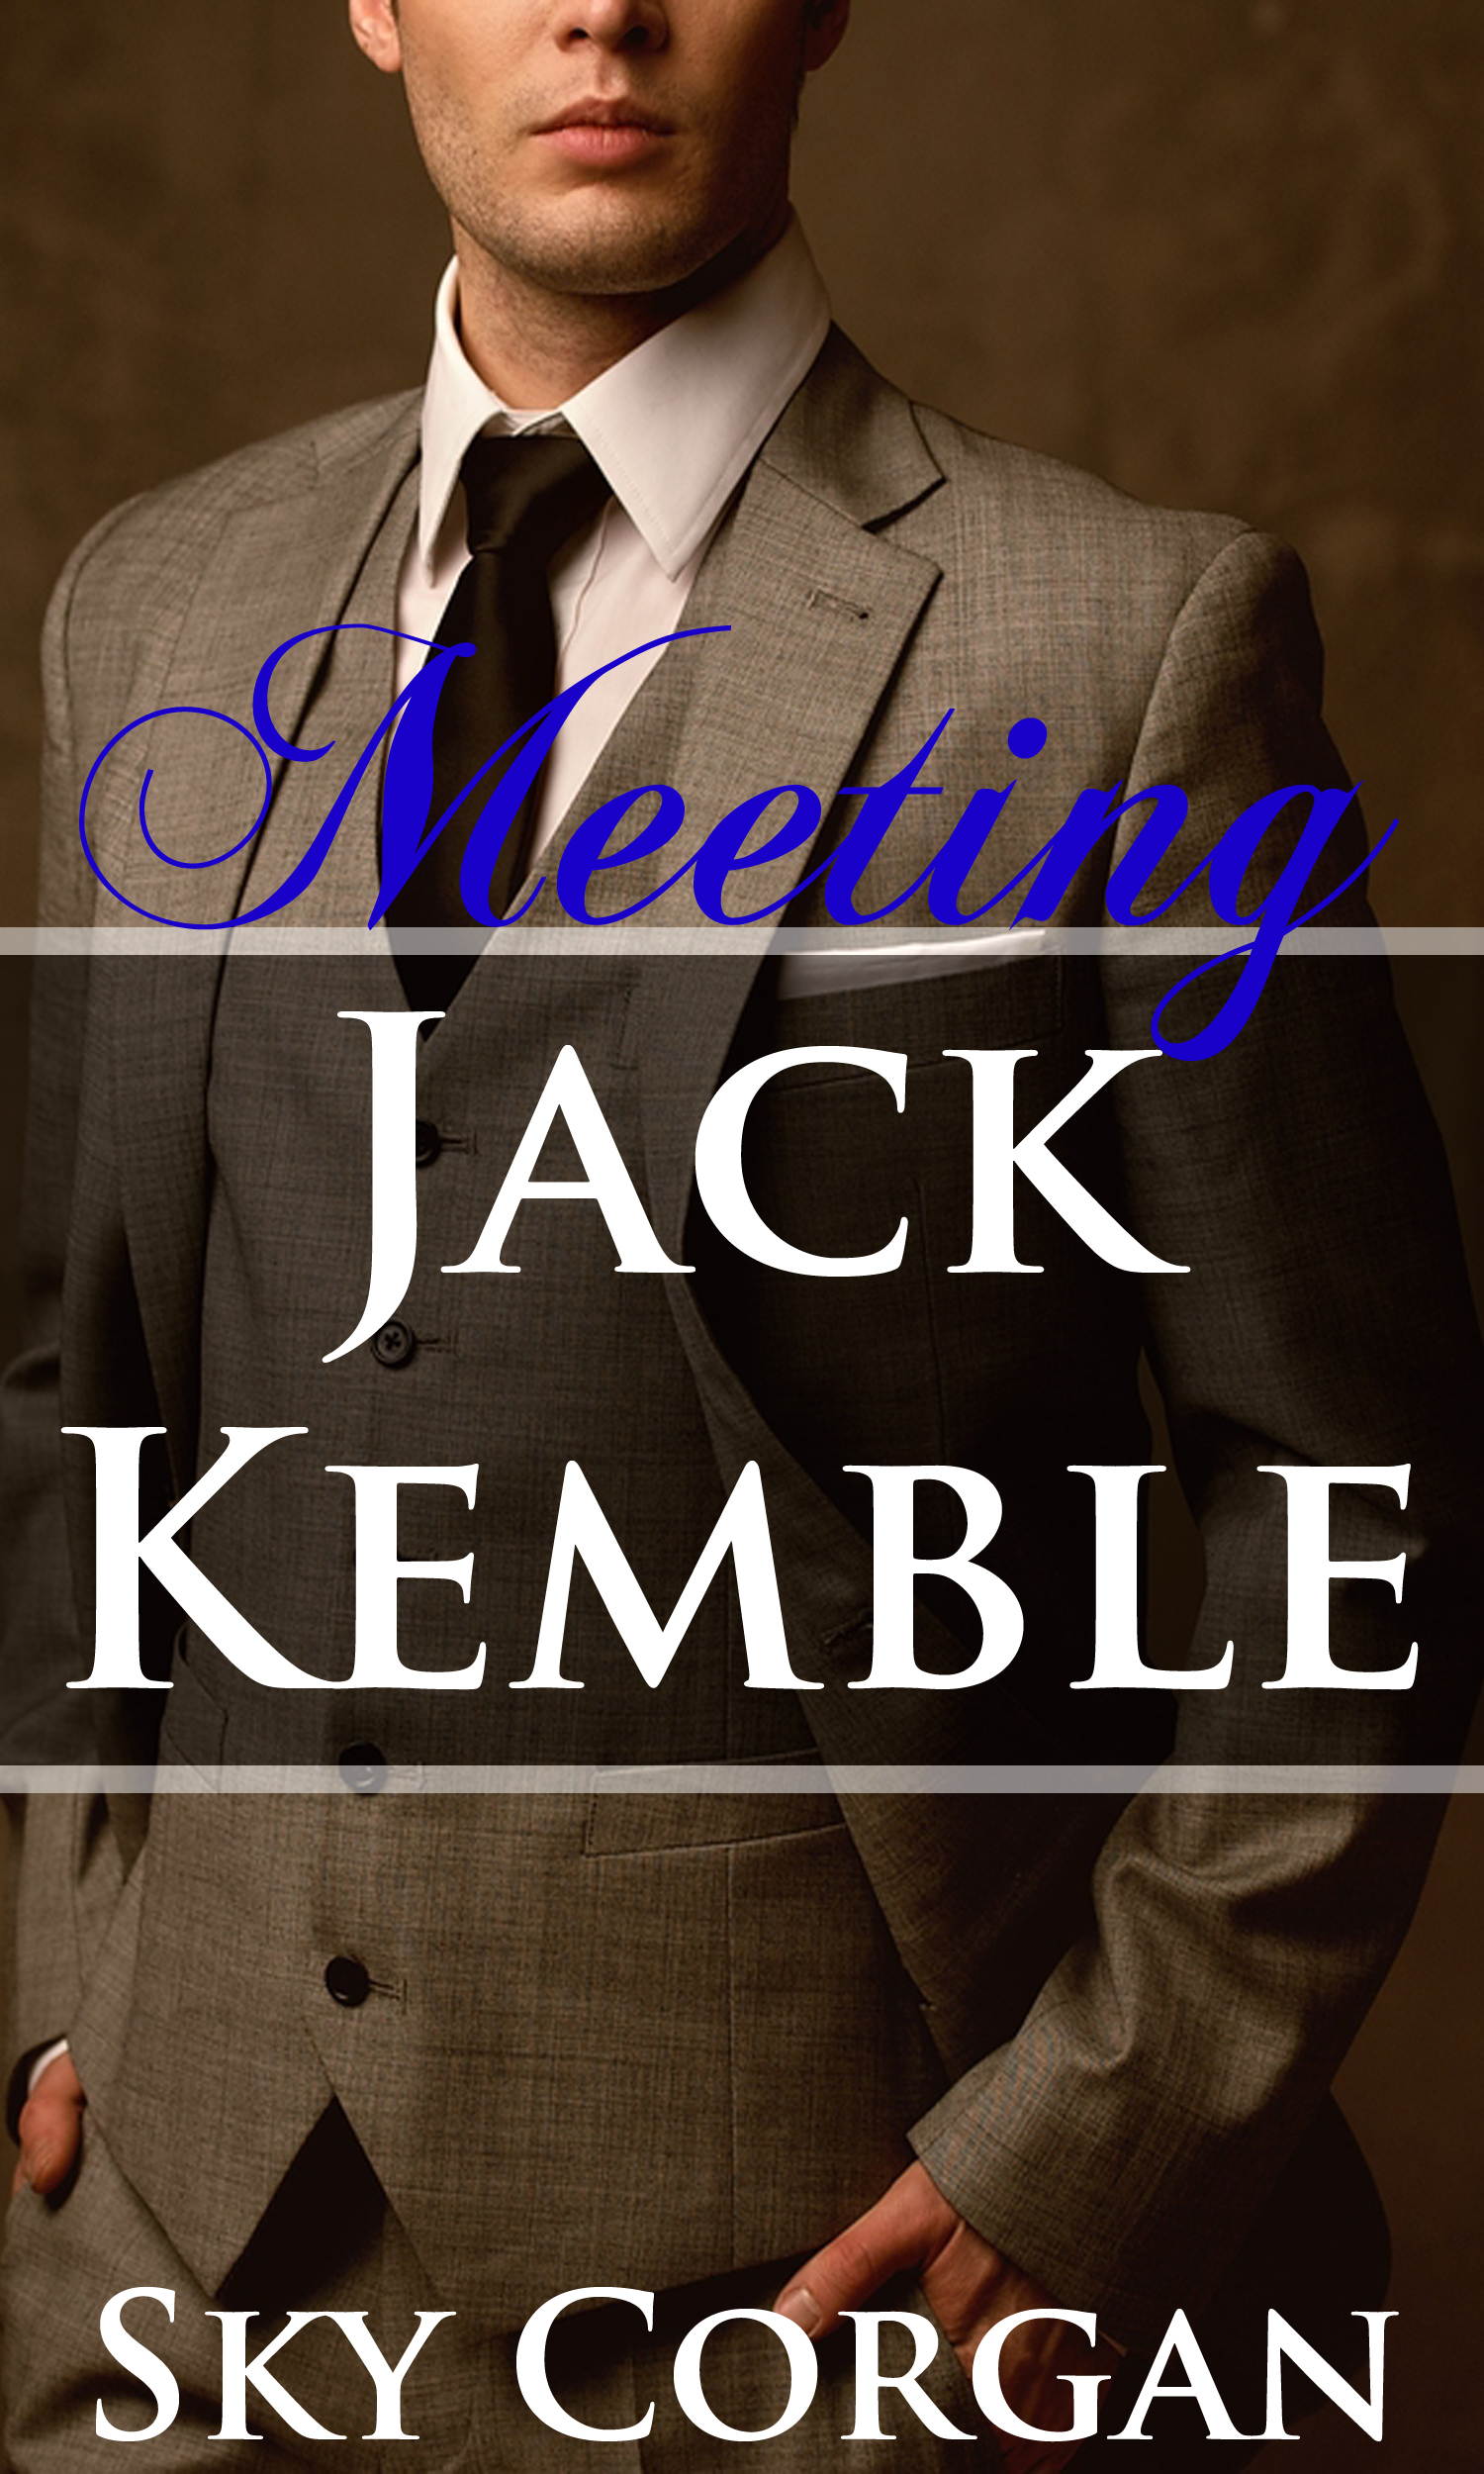 Meeting jack kemble